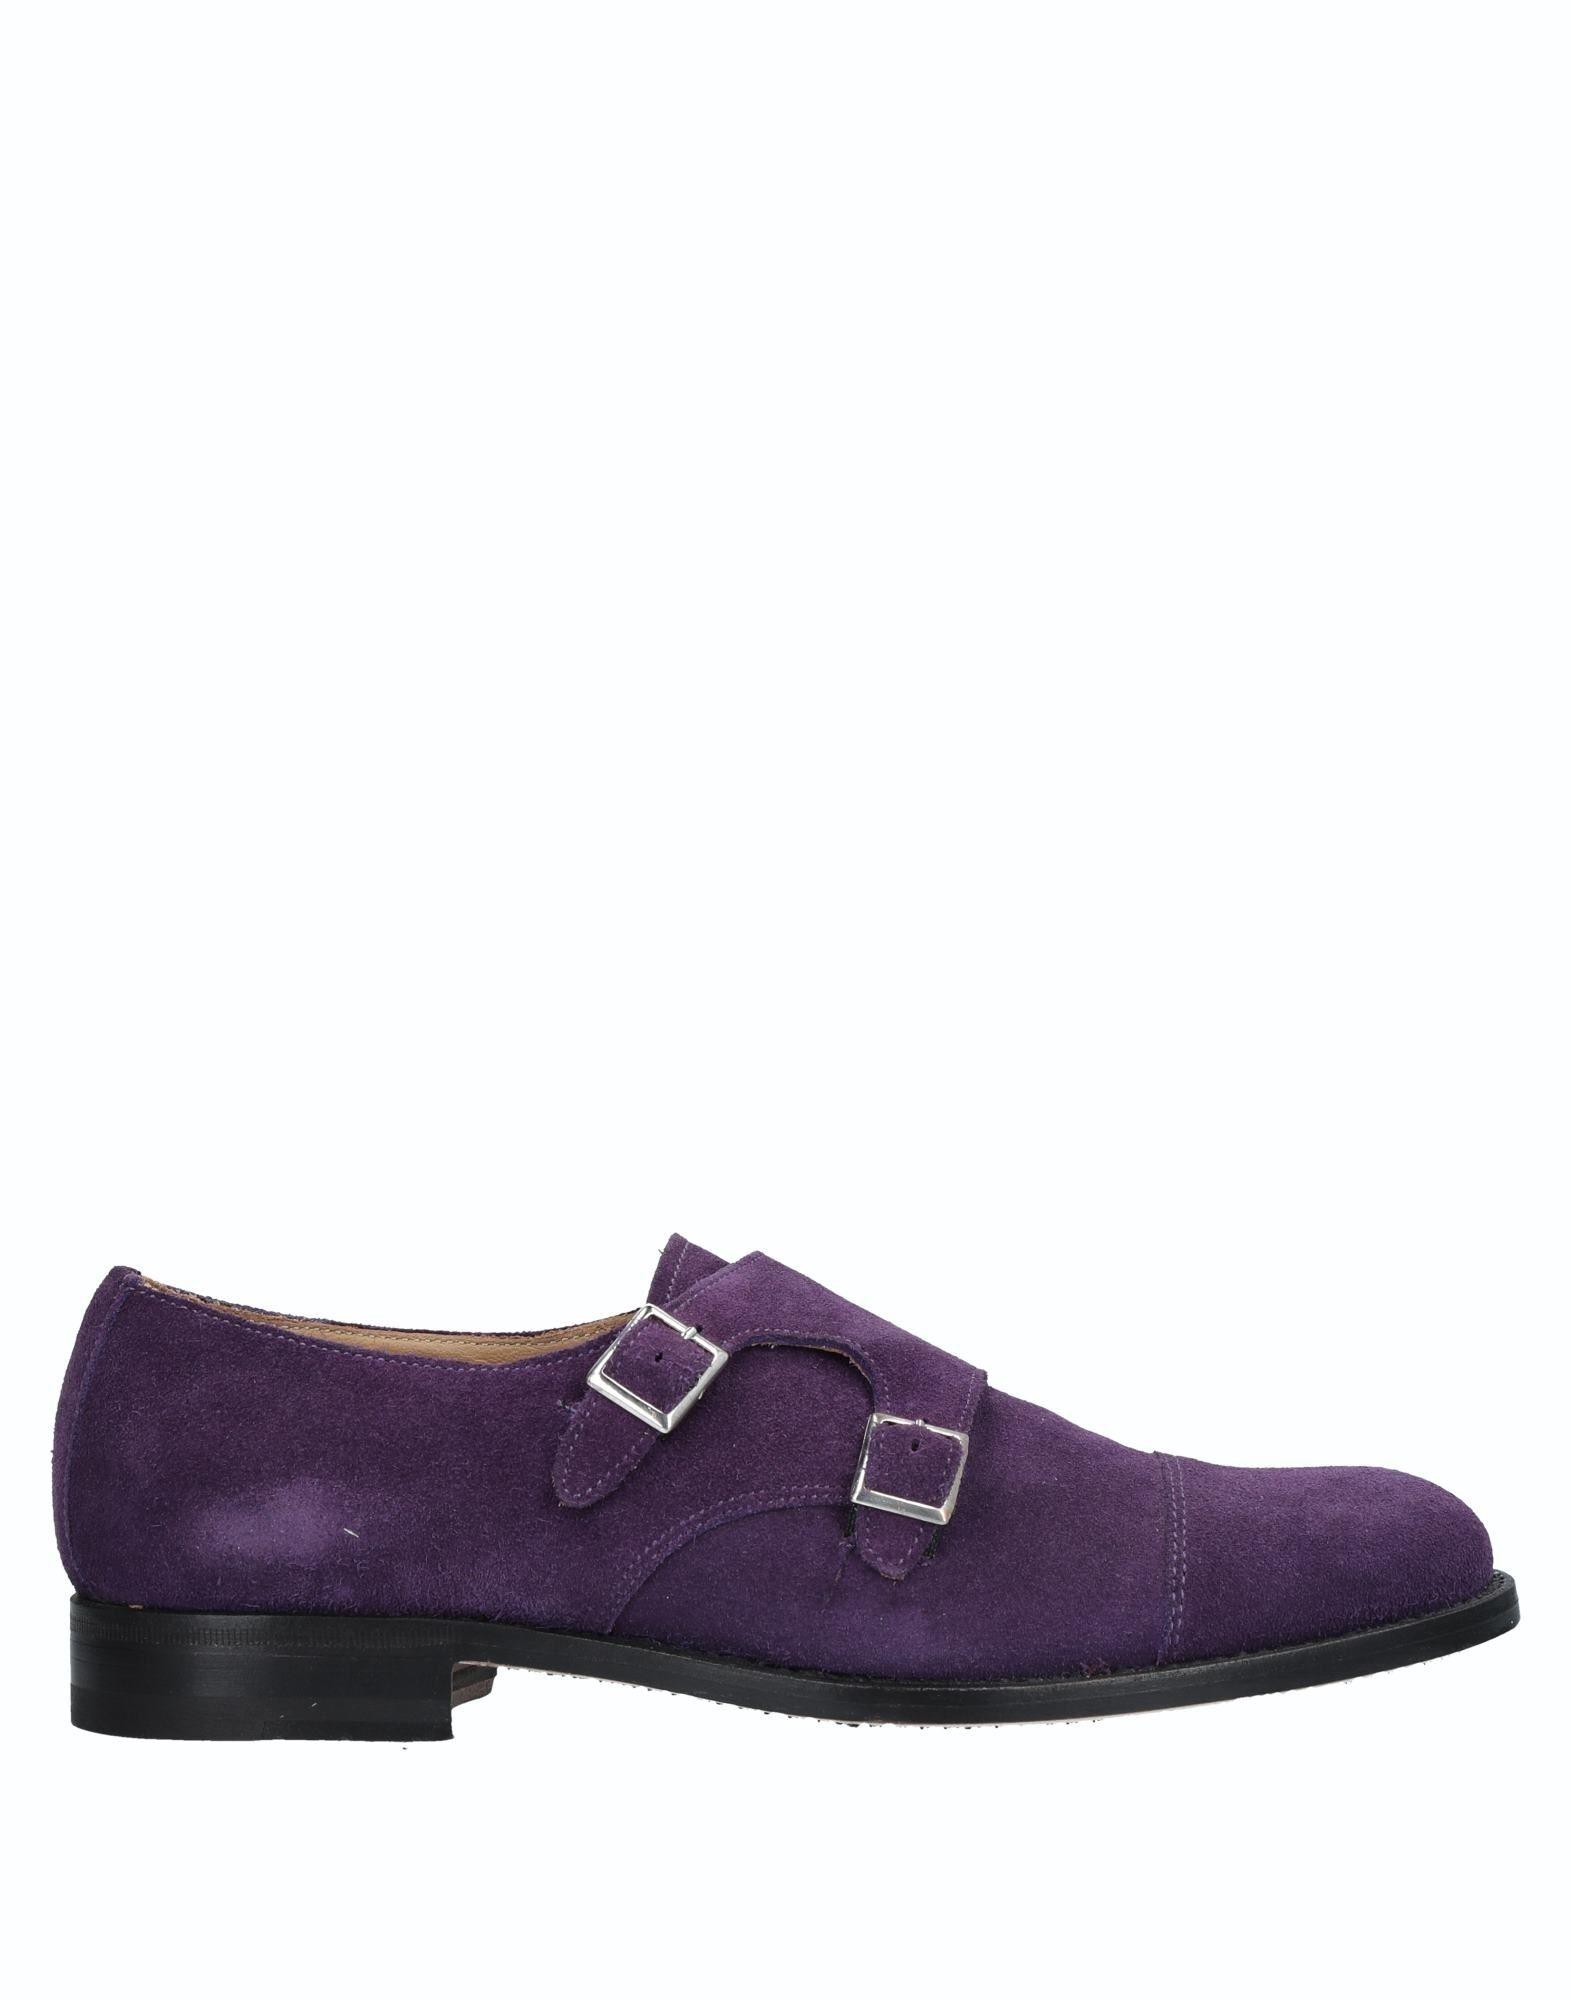 ARANTH Loafers in Purple